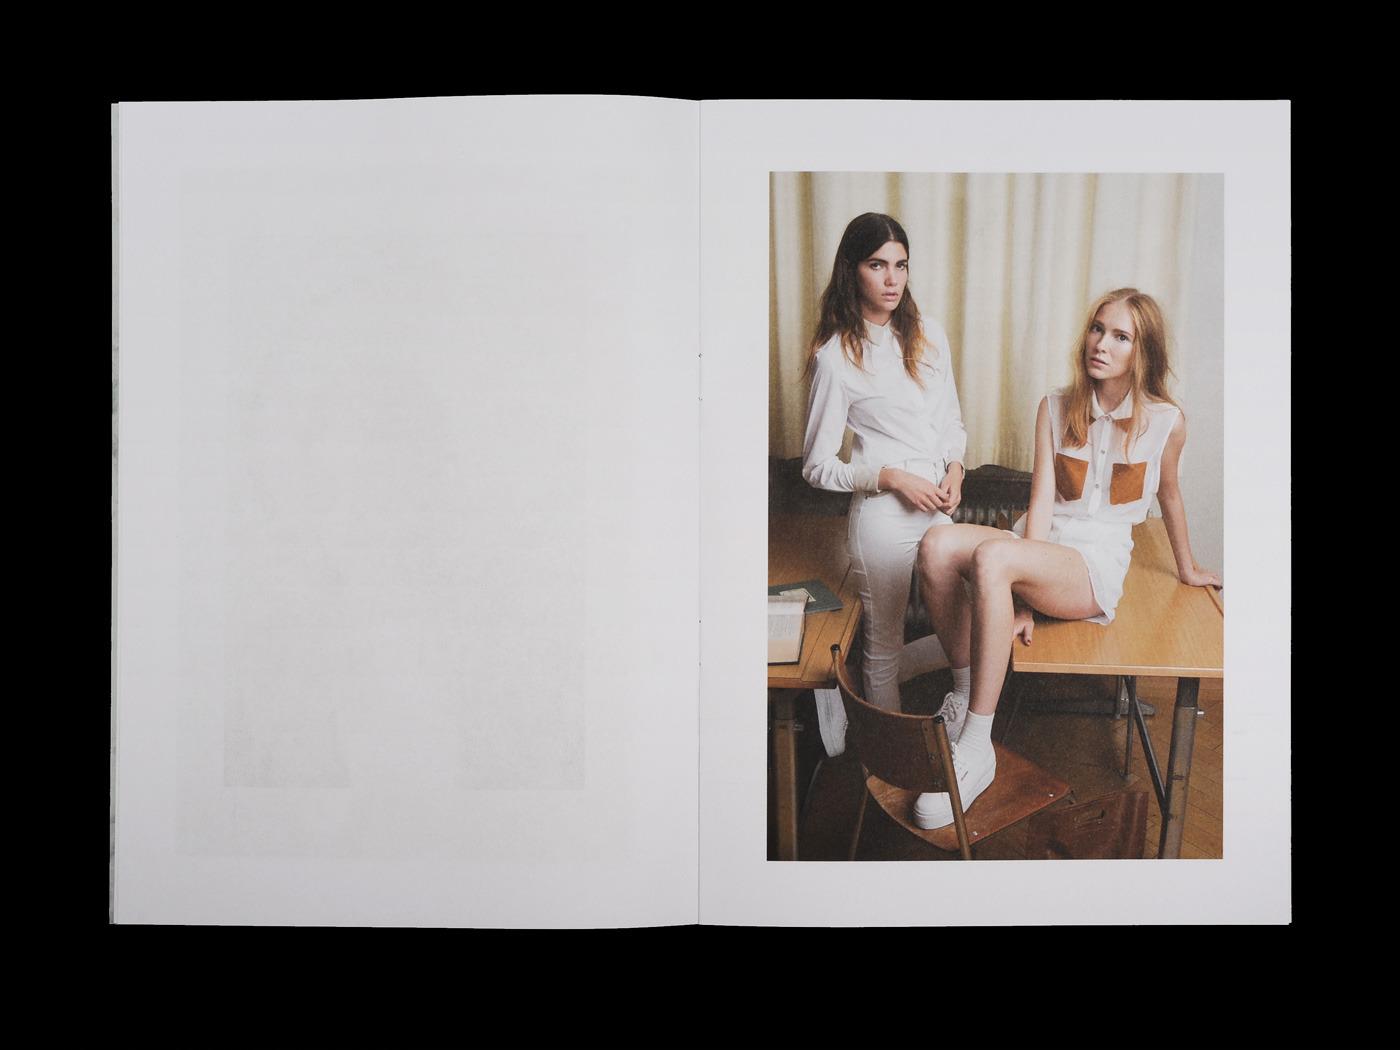 Bureau Collective – Stefanie Biggel Lookbook